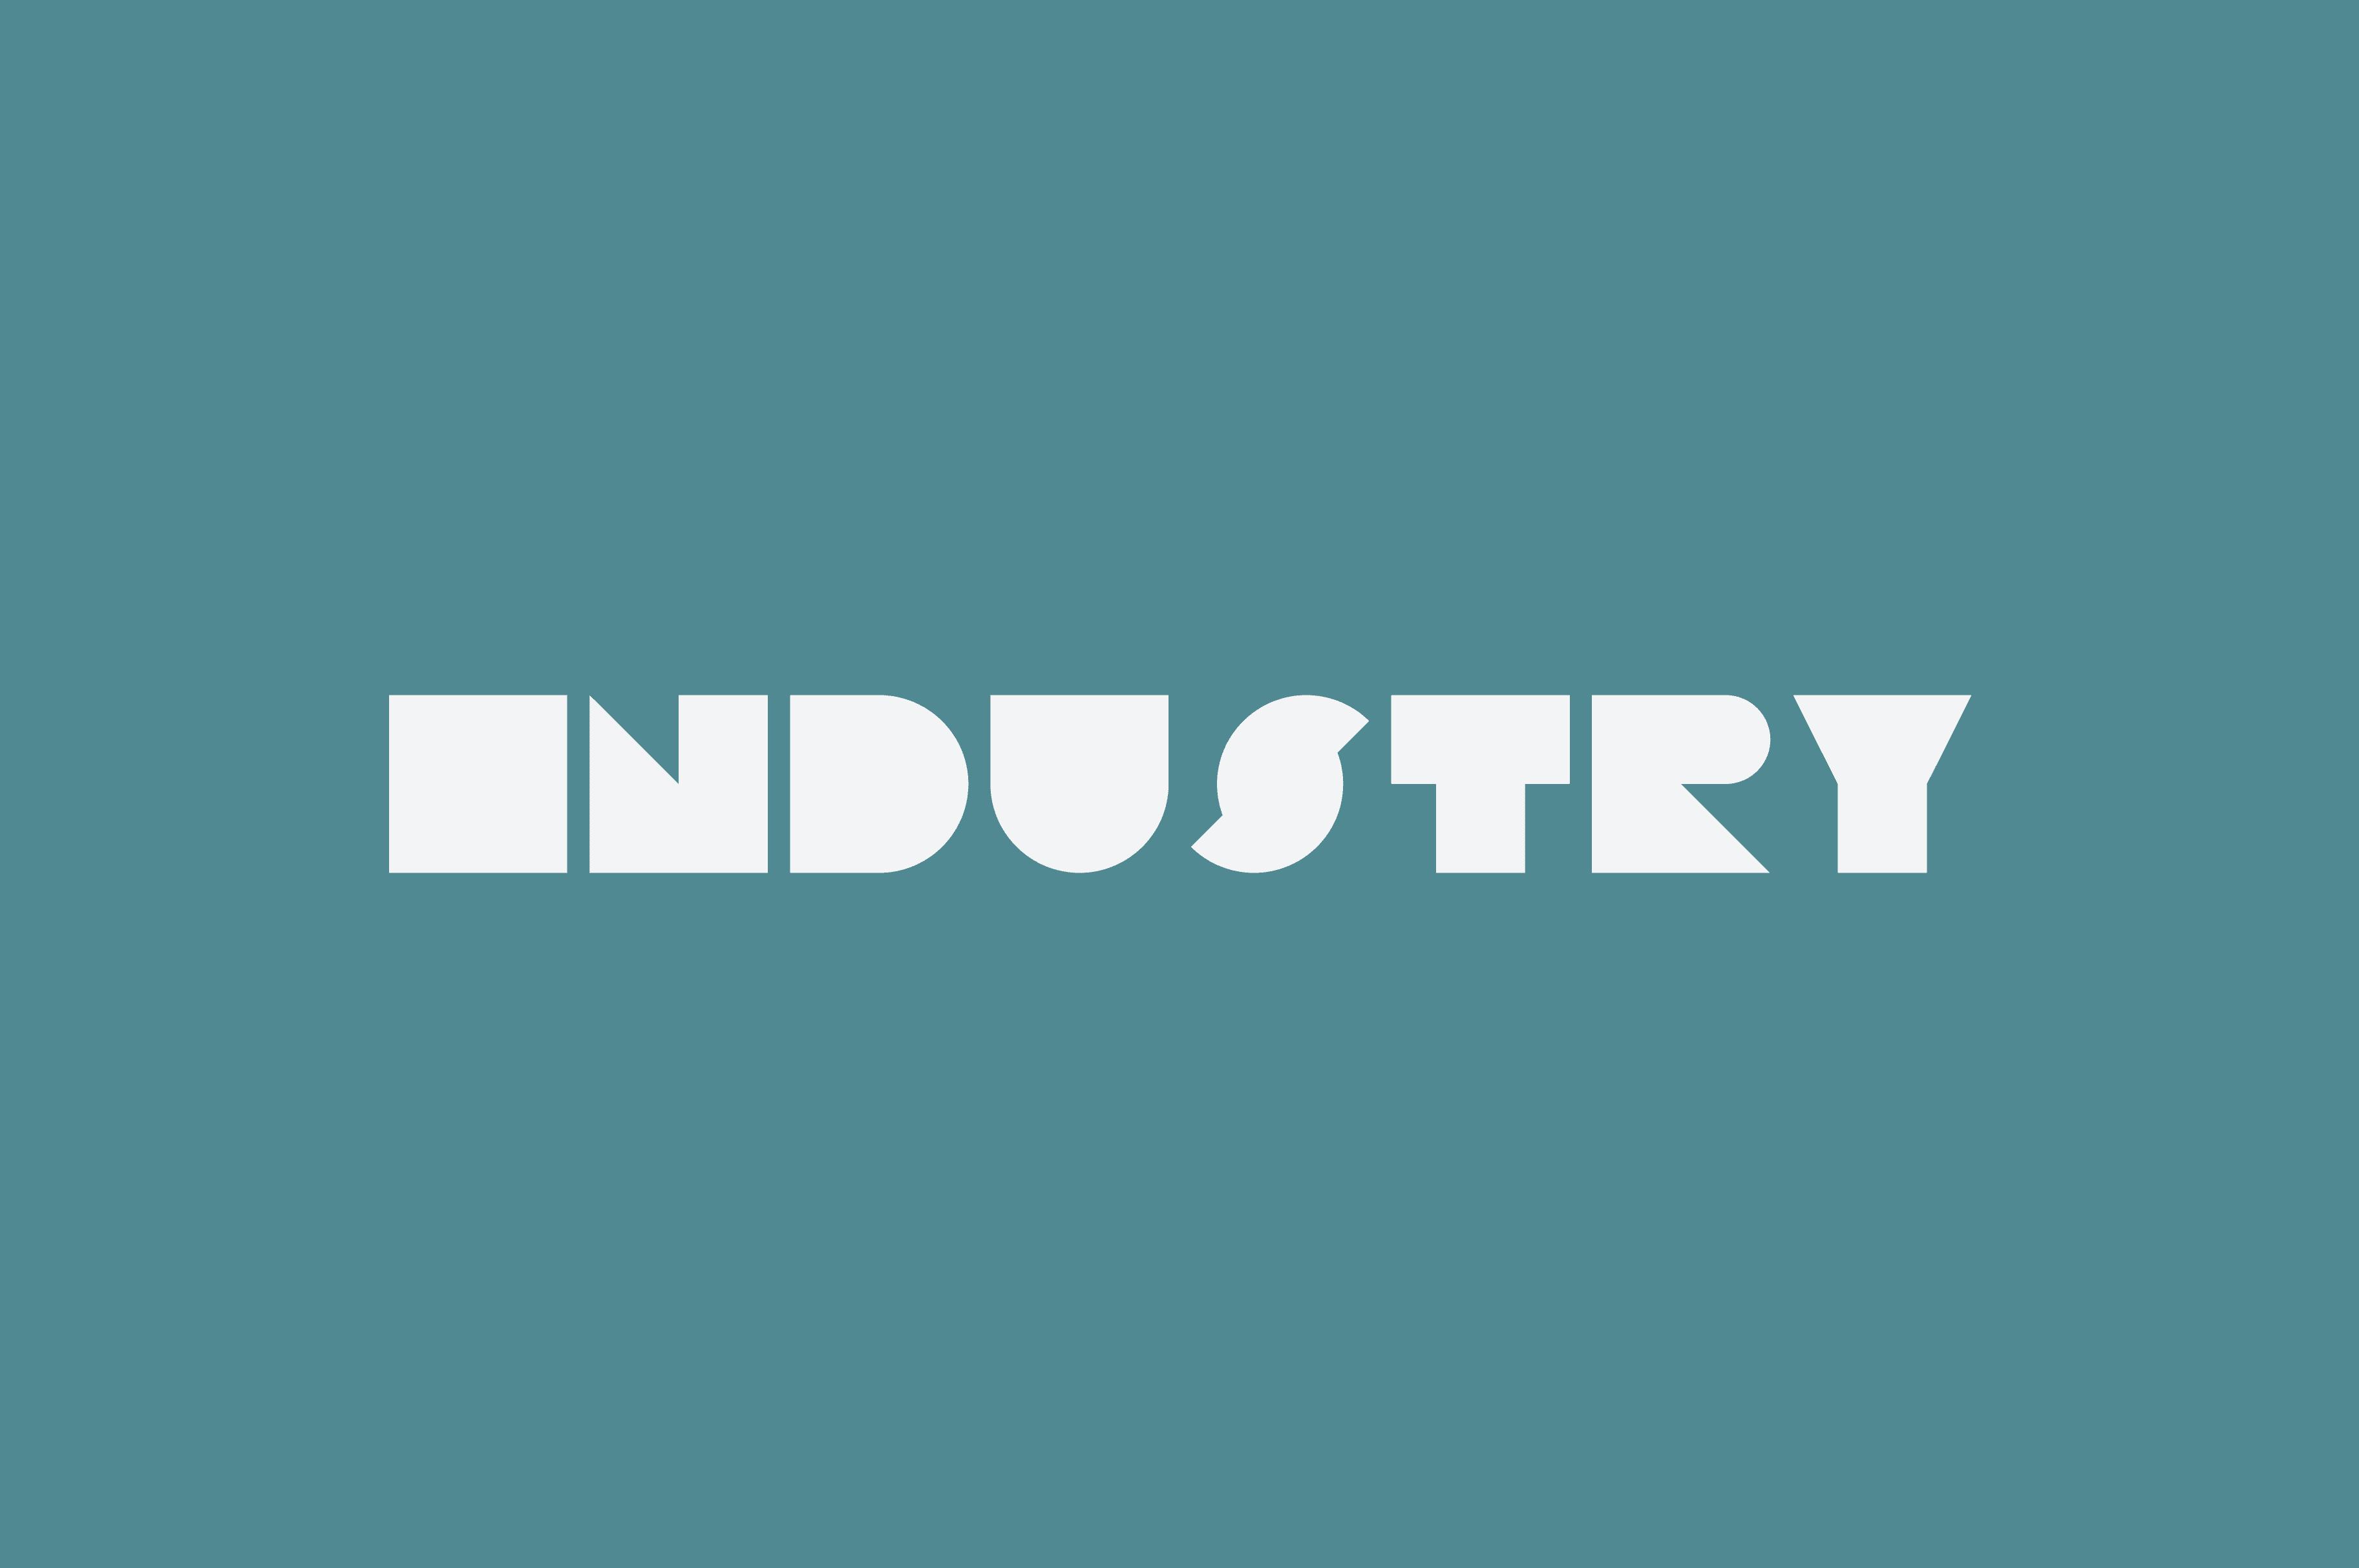 Industry logo design